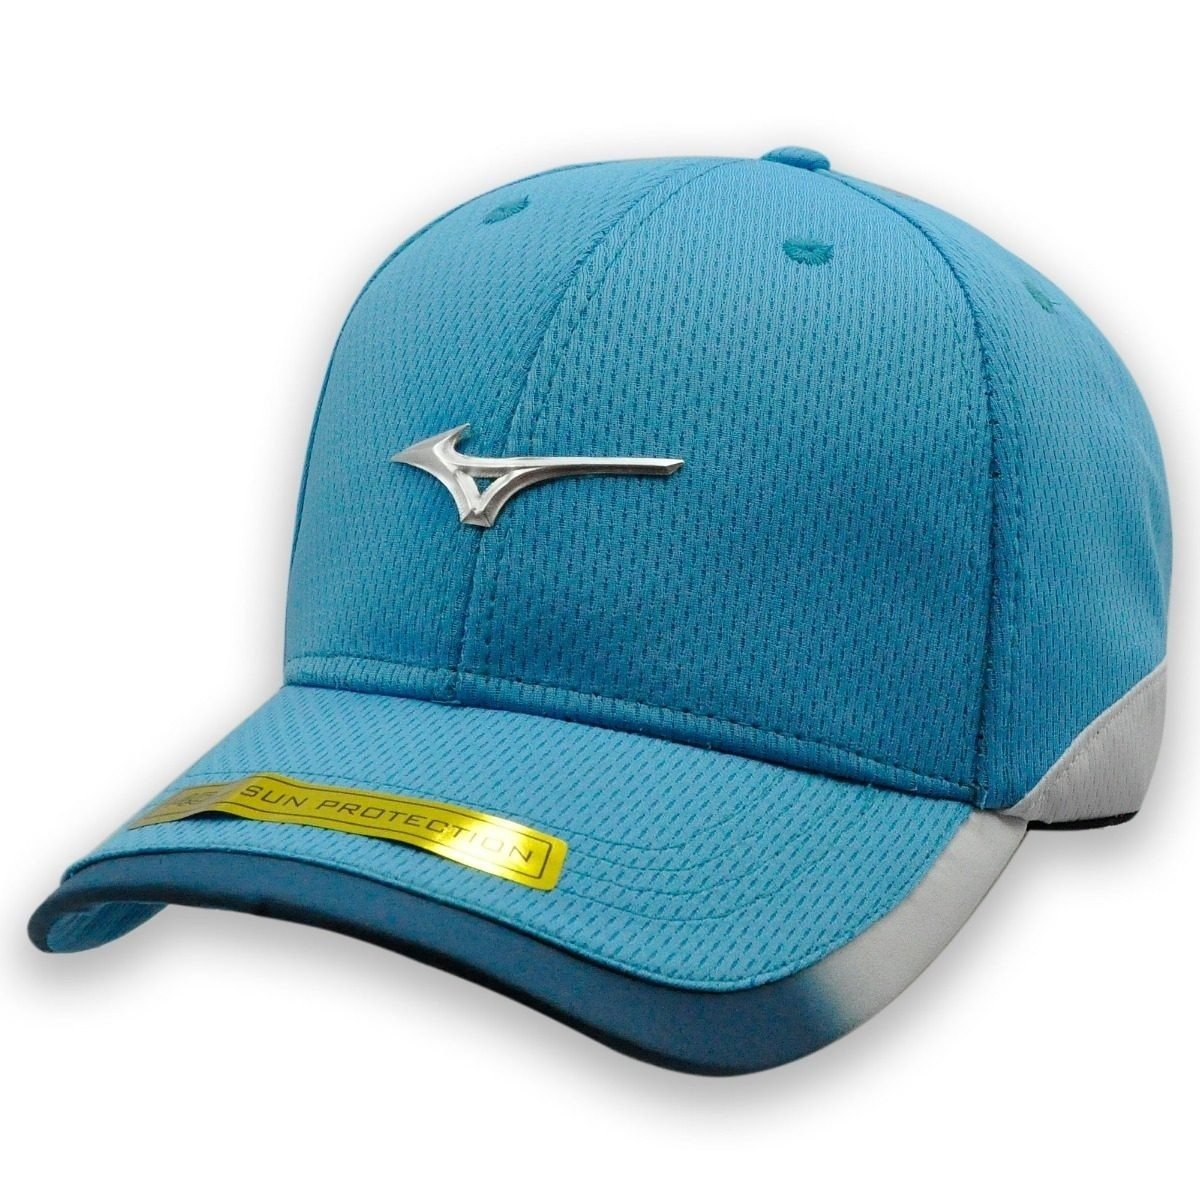 Boné Mizuno Golf Boné Aba Curva Flexfit Lançamento Snapback - R  56 ... 0c45aca4823